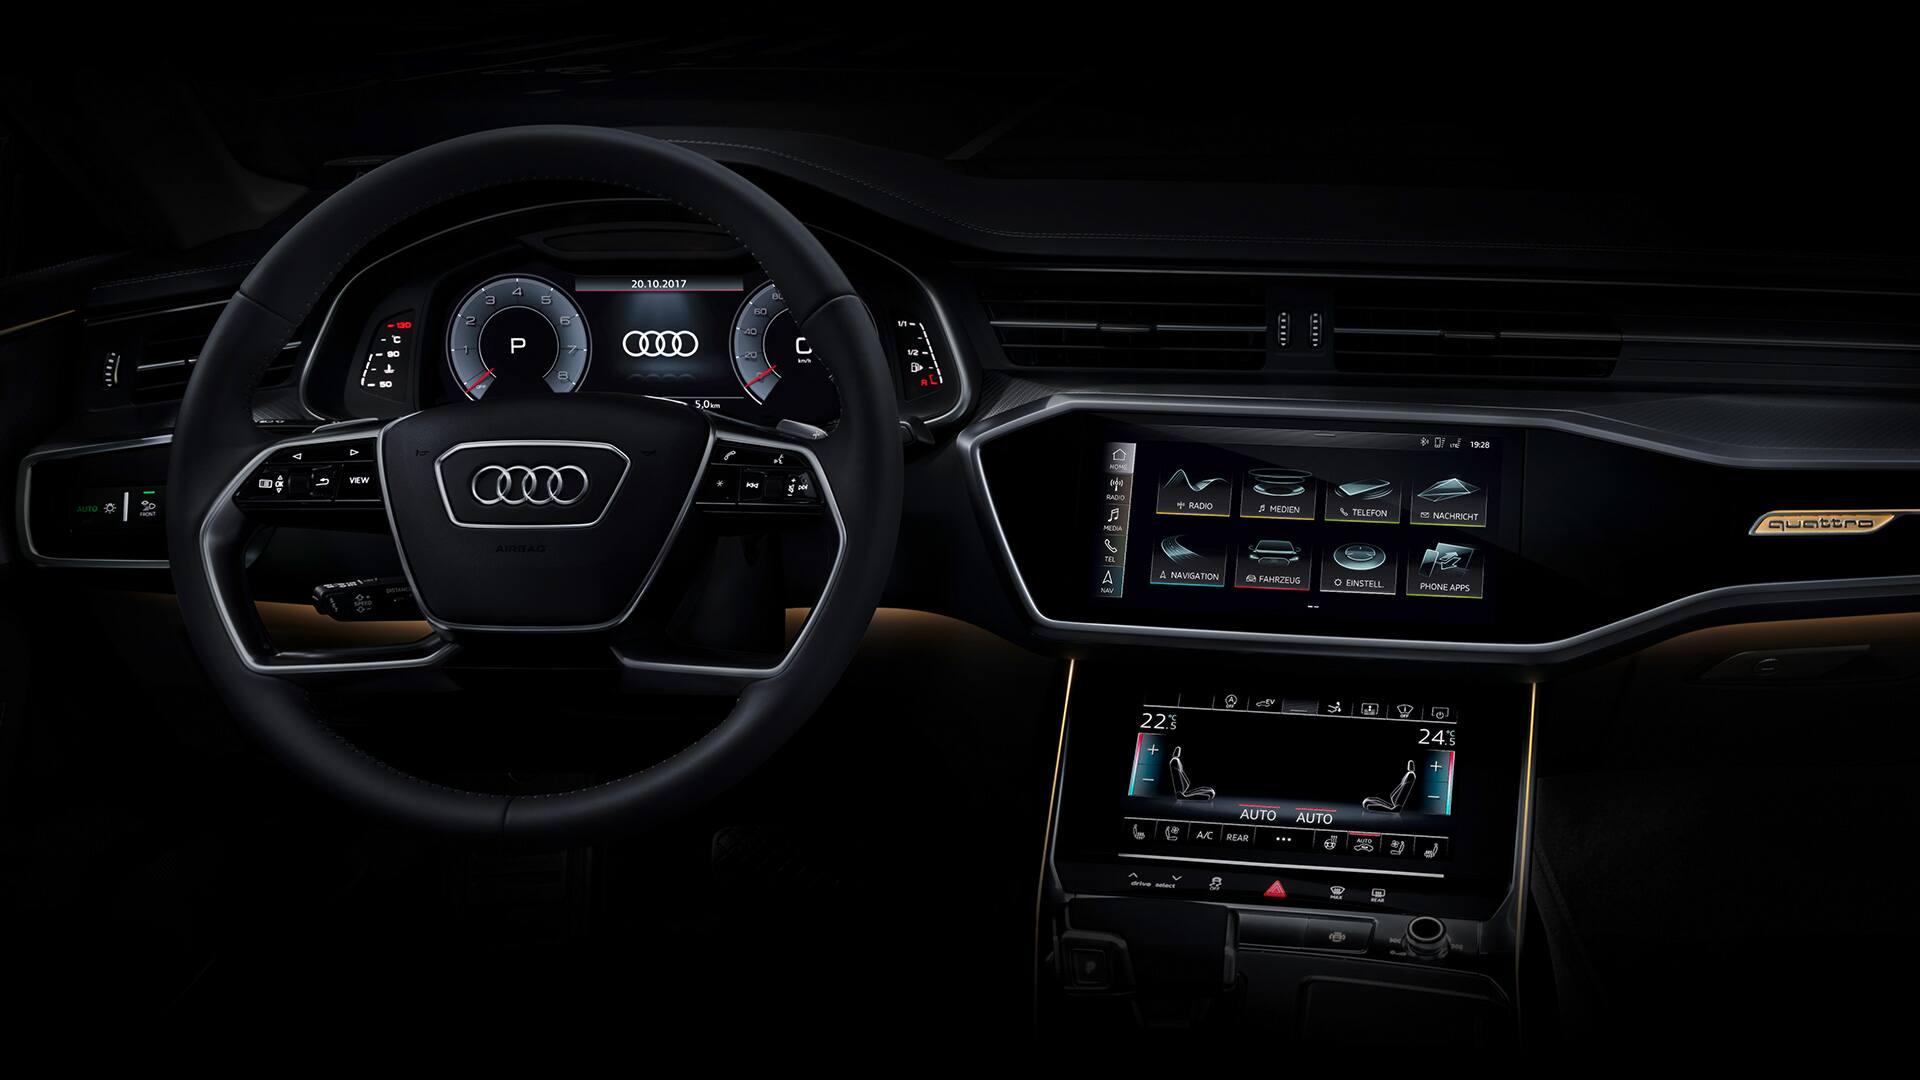 Audi A7 Sportback > A7 > アウ...